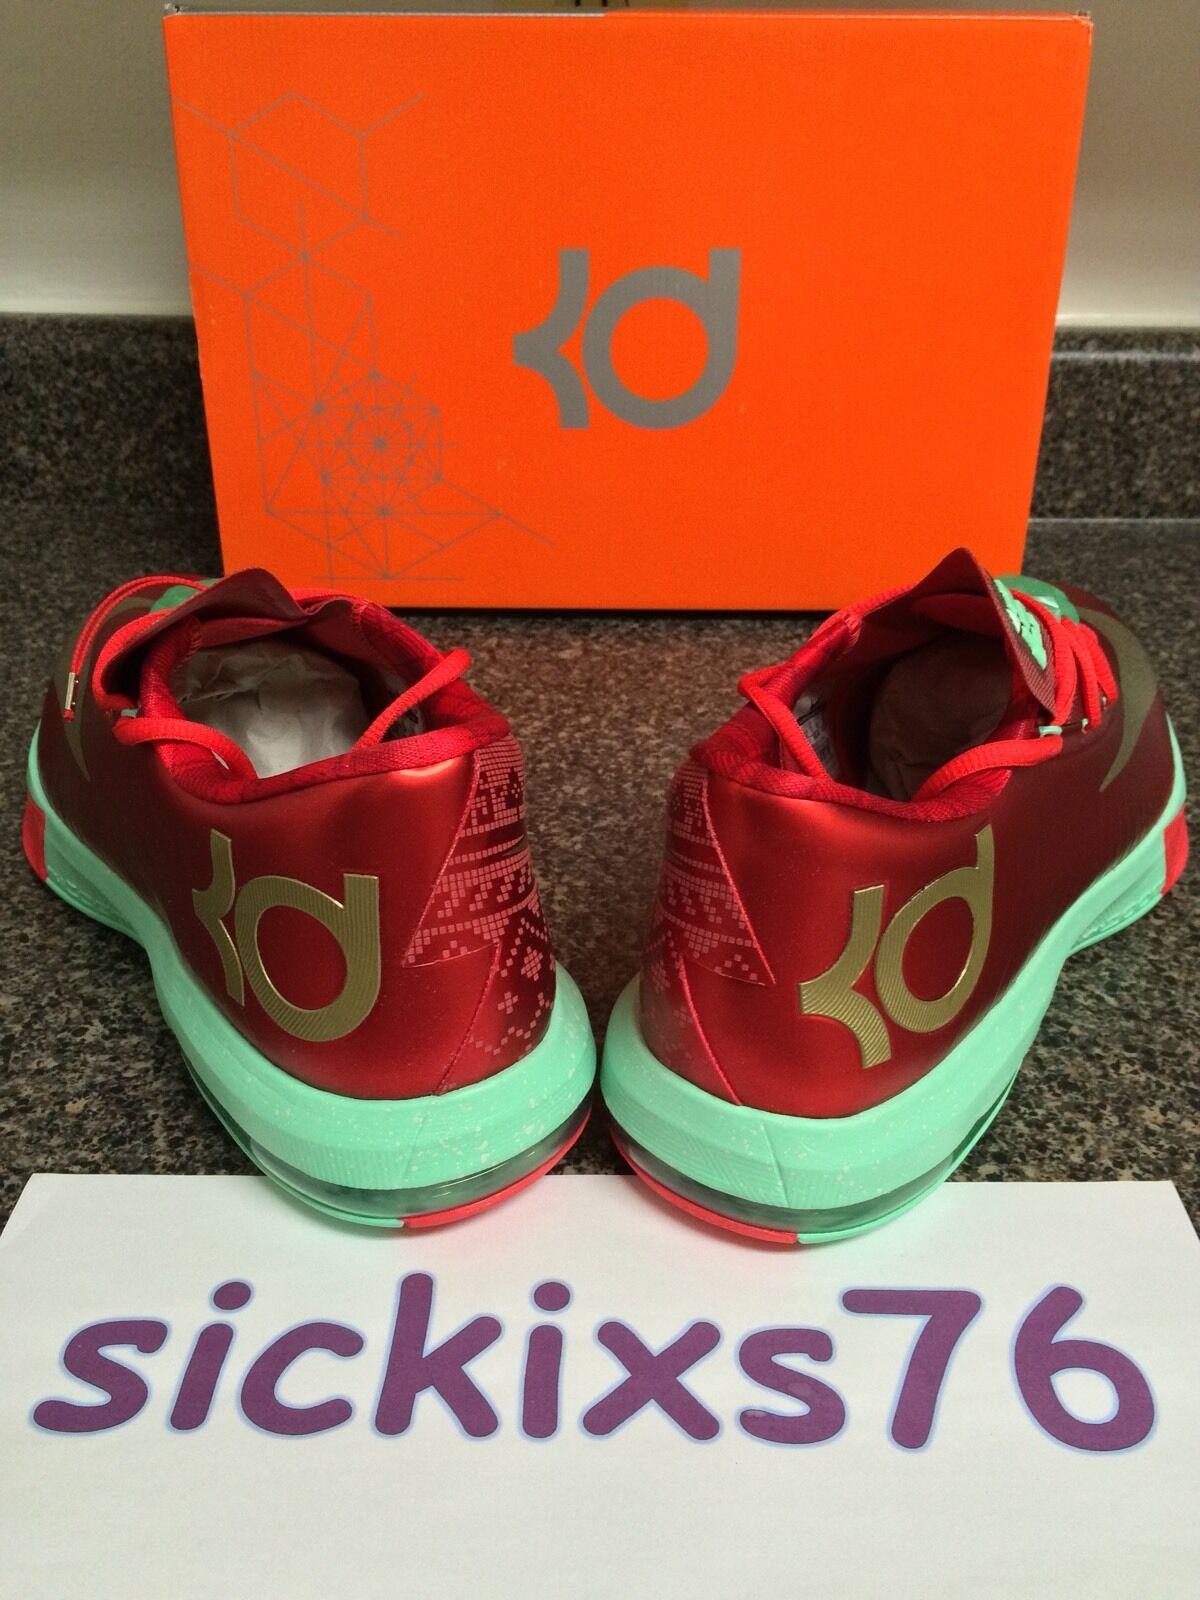 DS Men's Nike KD VI 'Christmas' Sz 10 & 12/& 46 [599424 601] 6 X-MAS